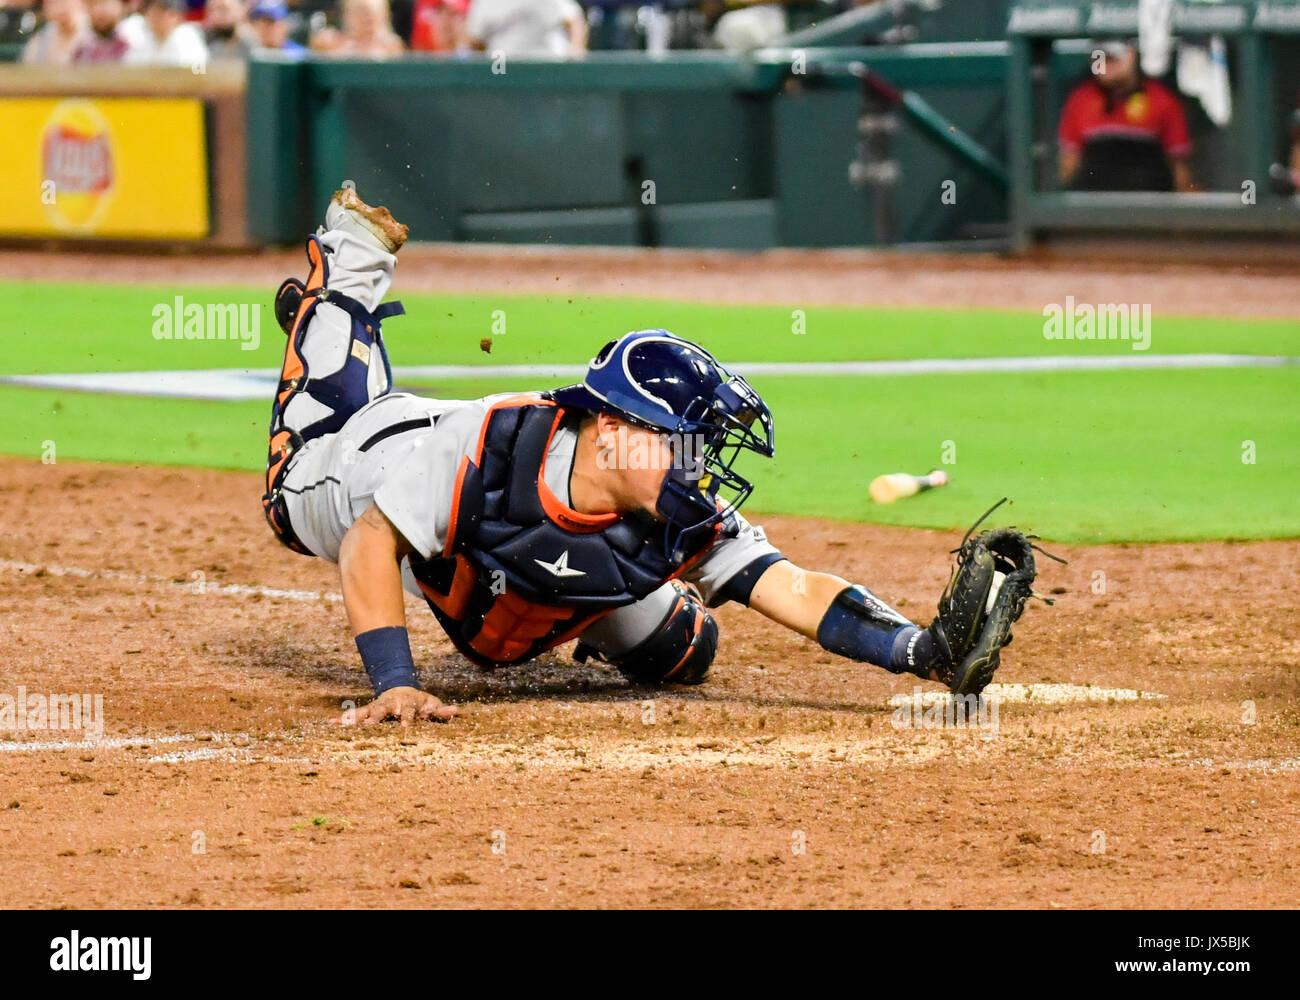 info for c00ab 7116e Aug 12, 2017: Houston Astros catcher Juan Centeno #30 dives ...